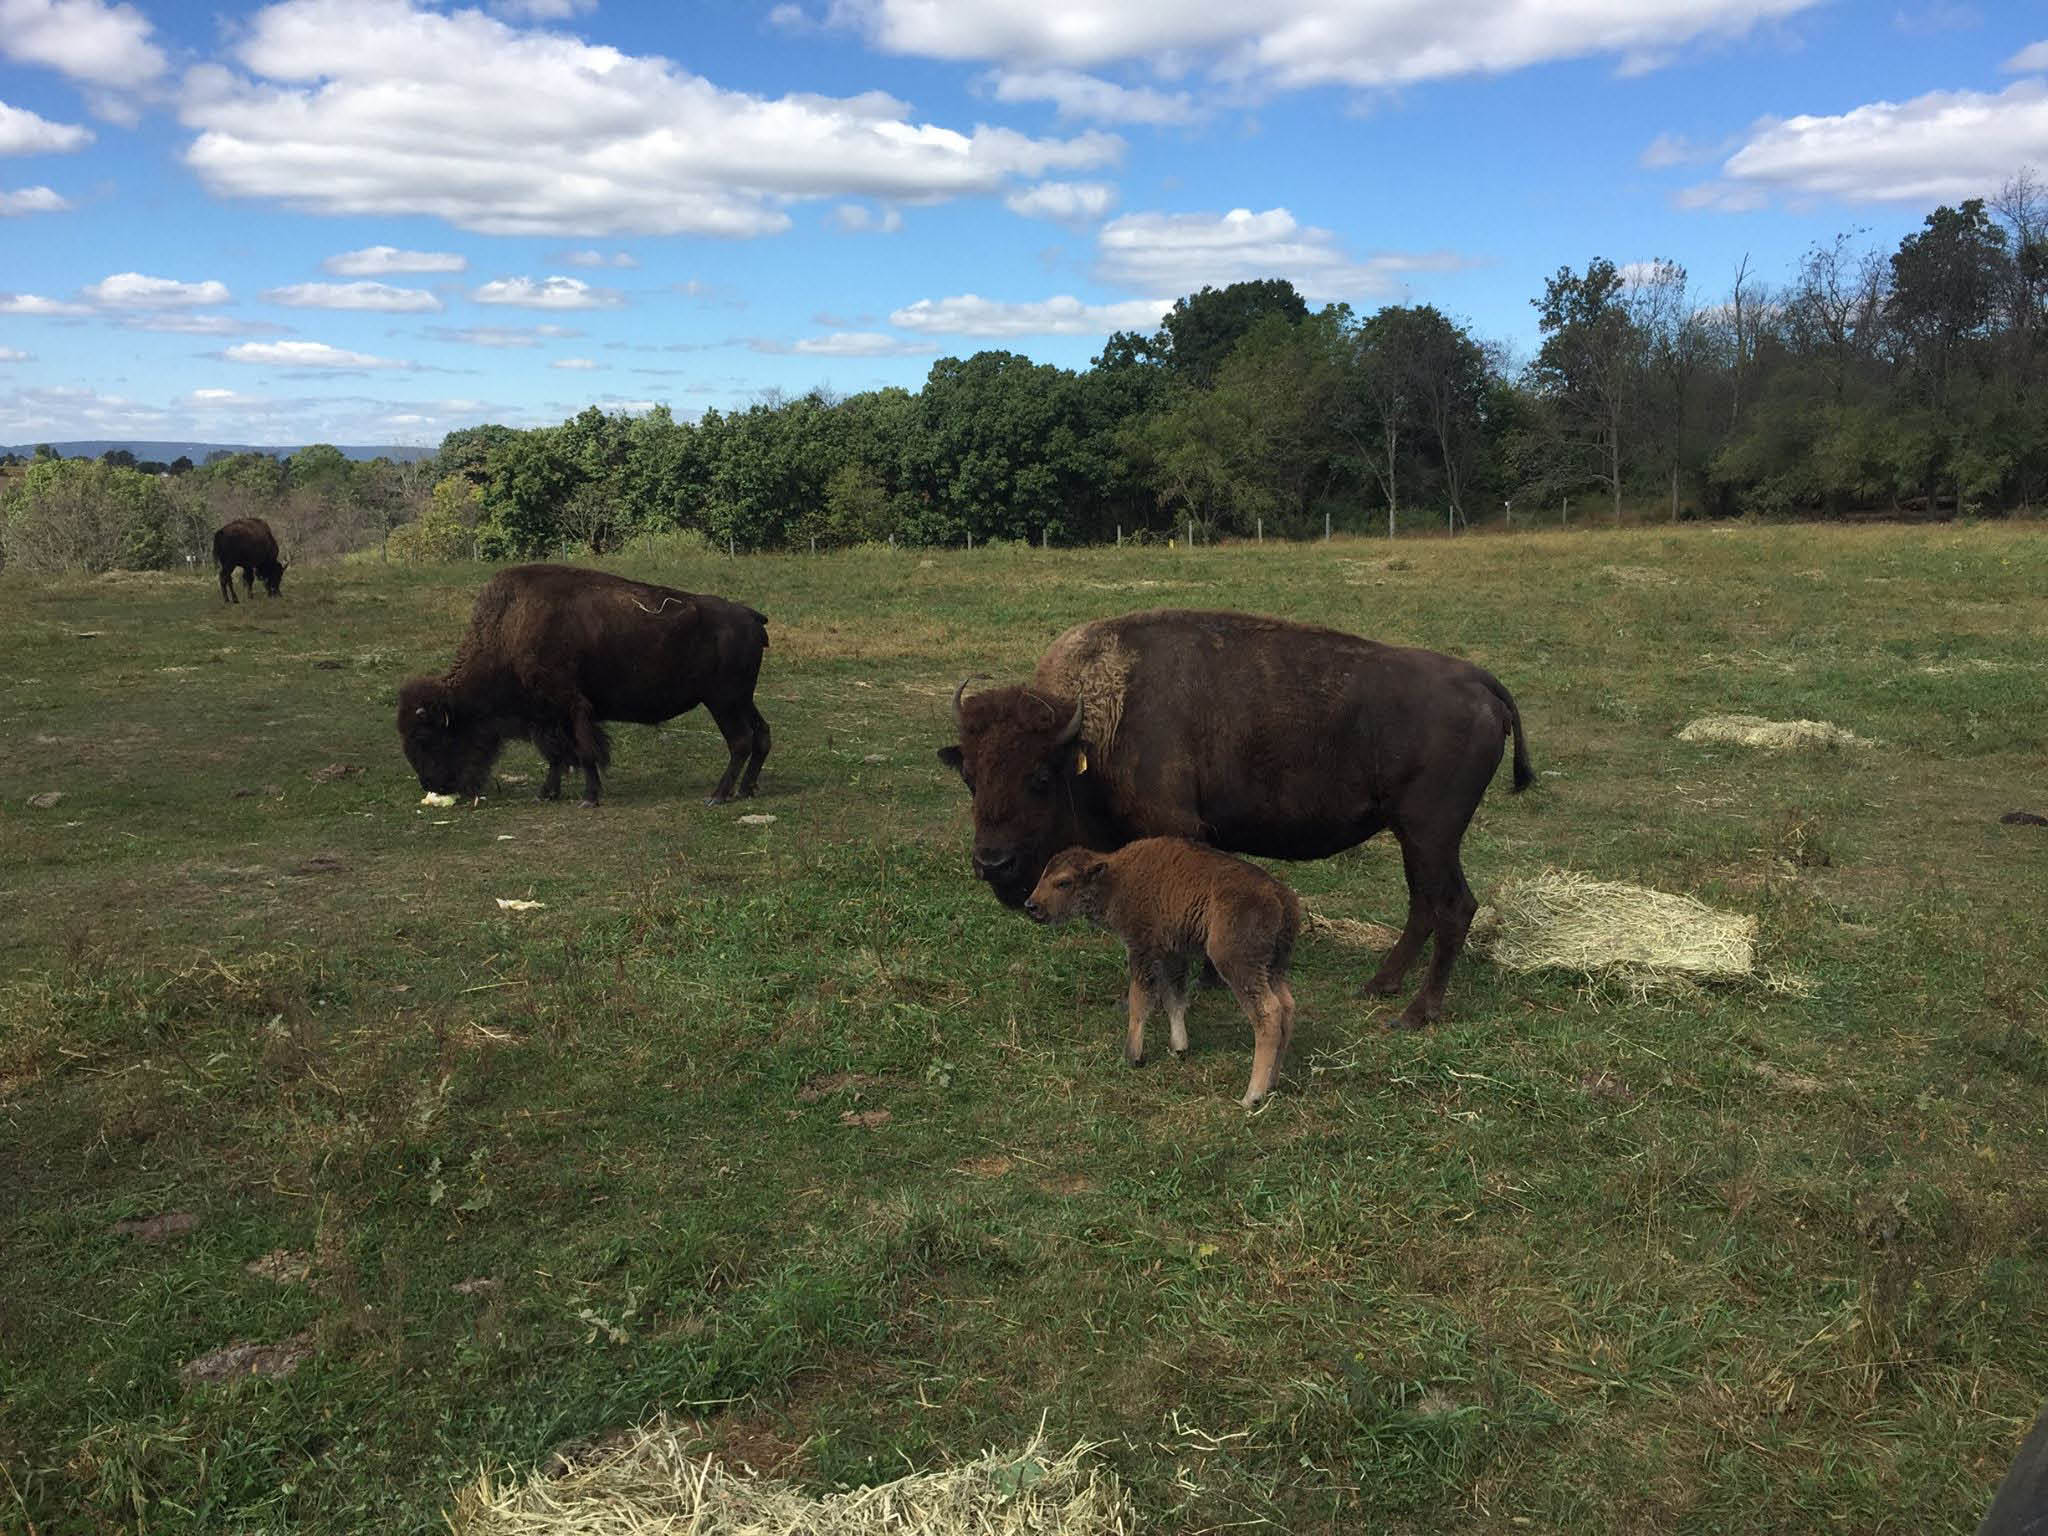 resident bison of the lehigh valley zoo, in schnecksville pennsylvania